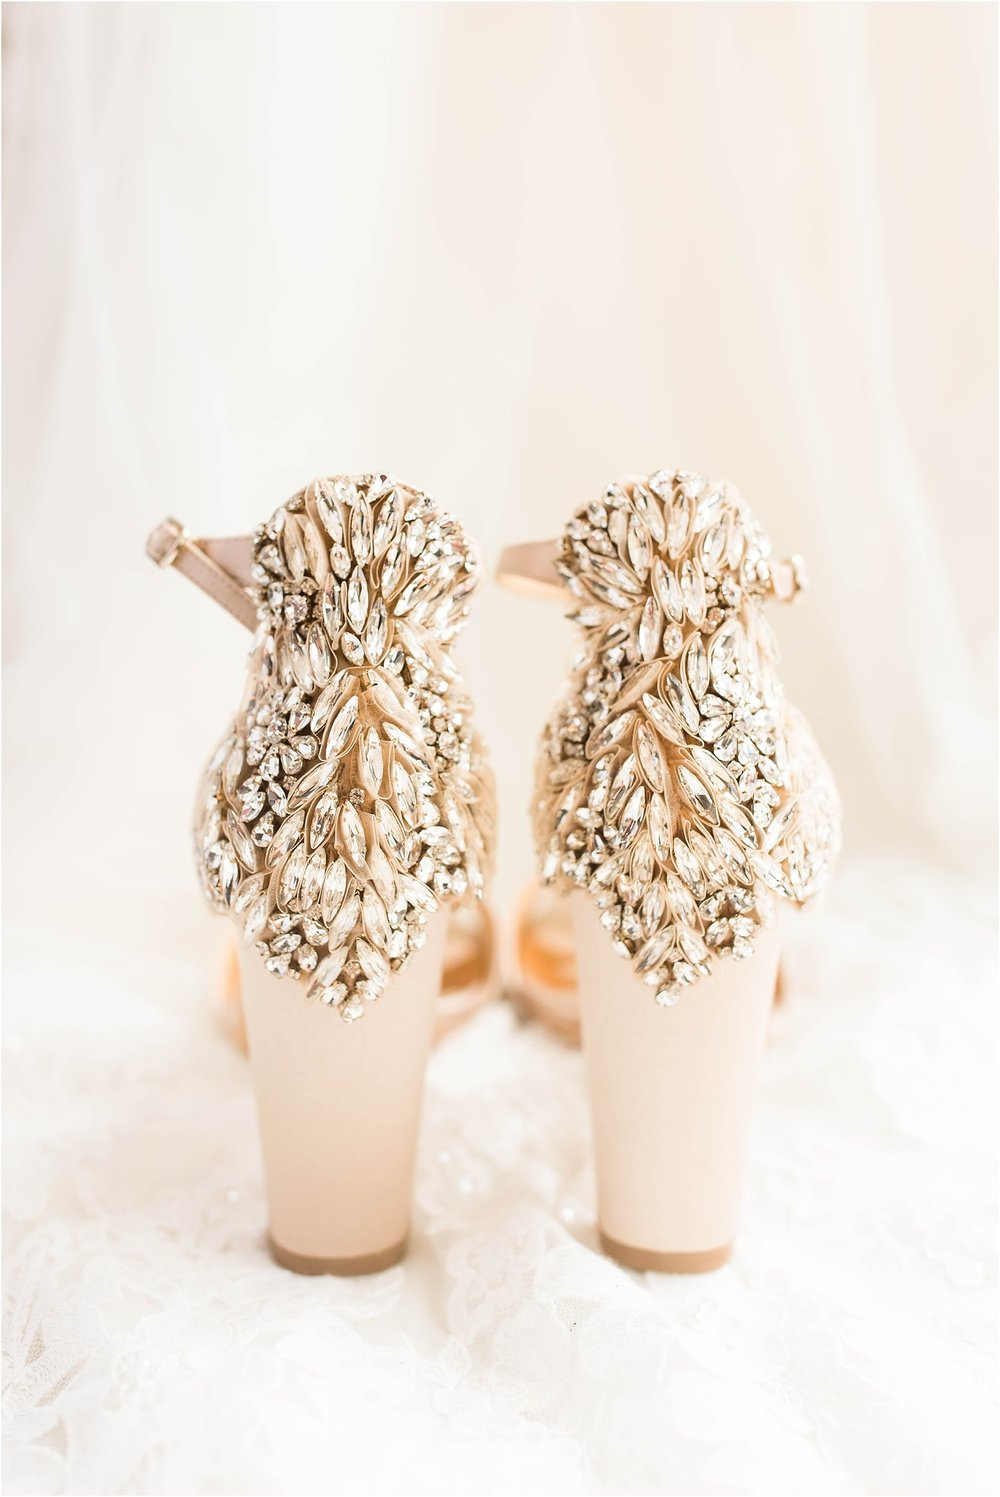 Red-Rose-Convention-Mint-Room-Wedding-Toronto-Mississauga-Brampton-Scarborough-GTA-Pakistani-Indian-Wedding-Engagement-Photographer-Photography_0082.jpg